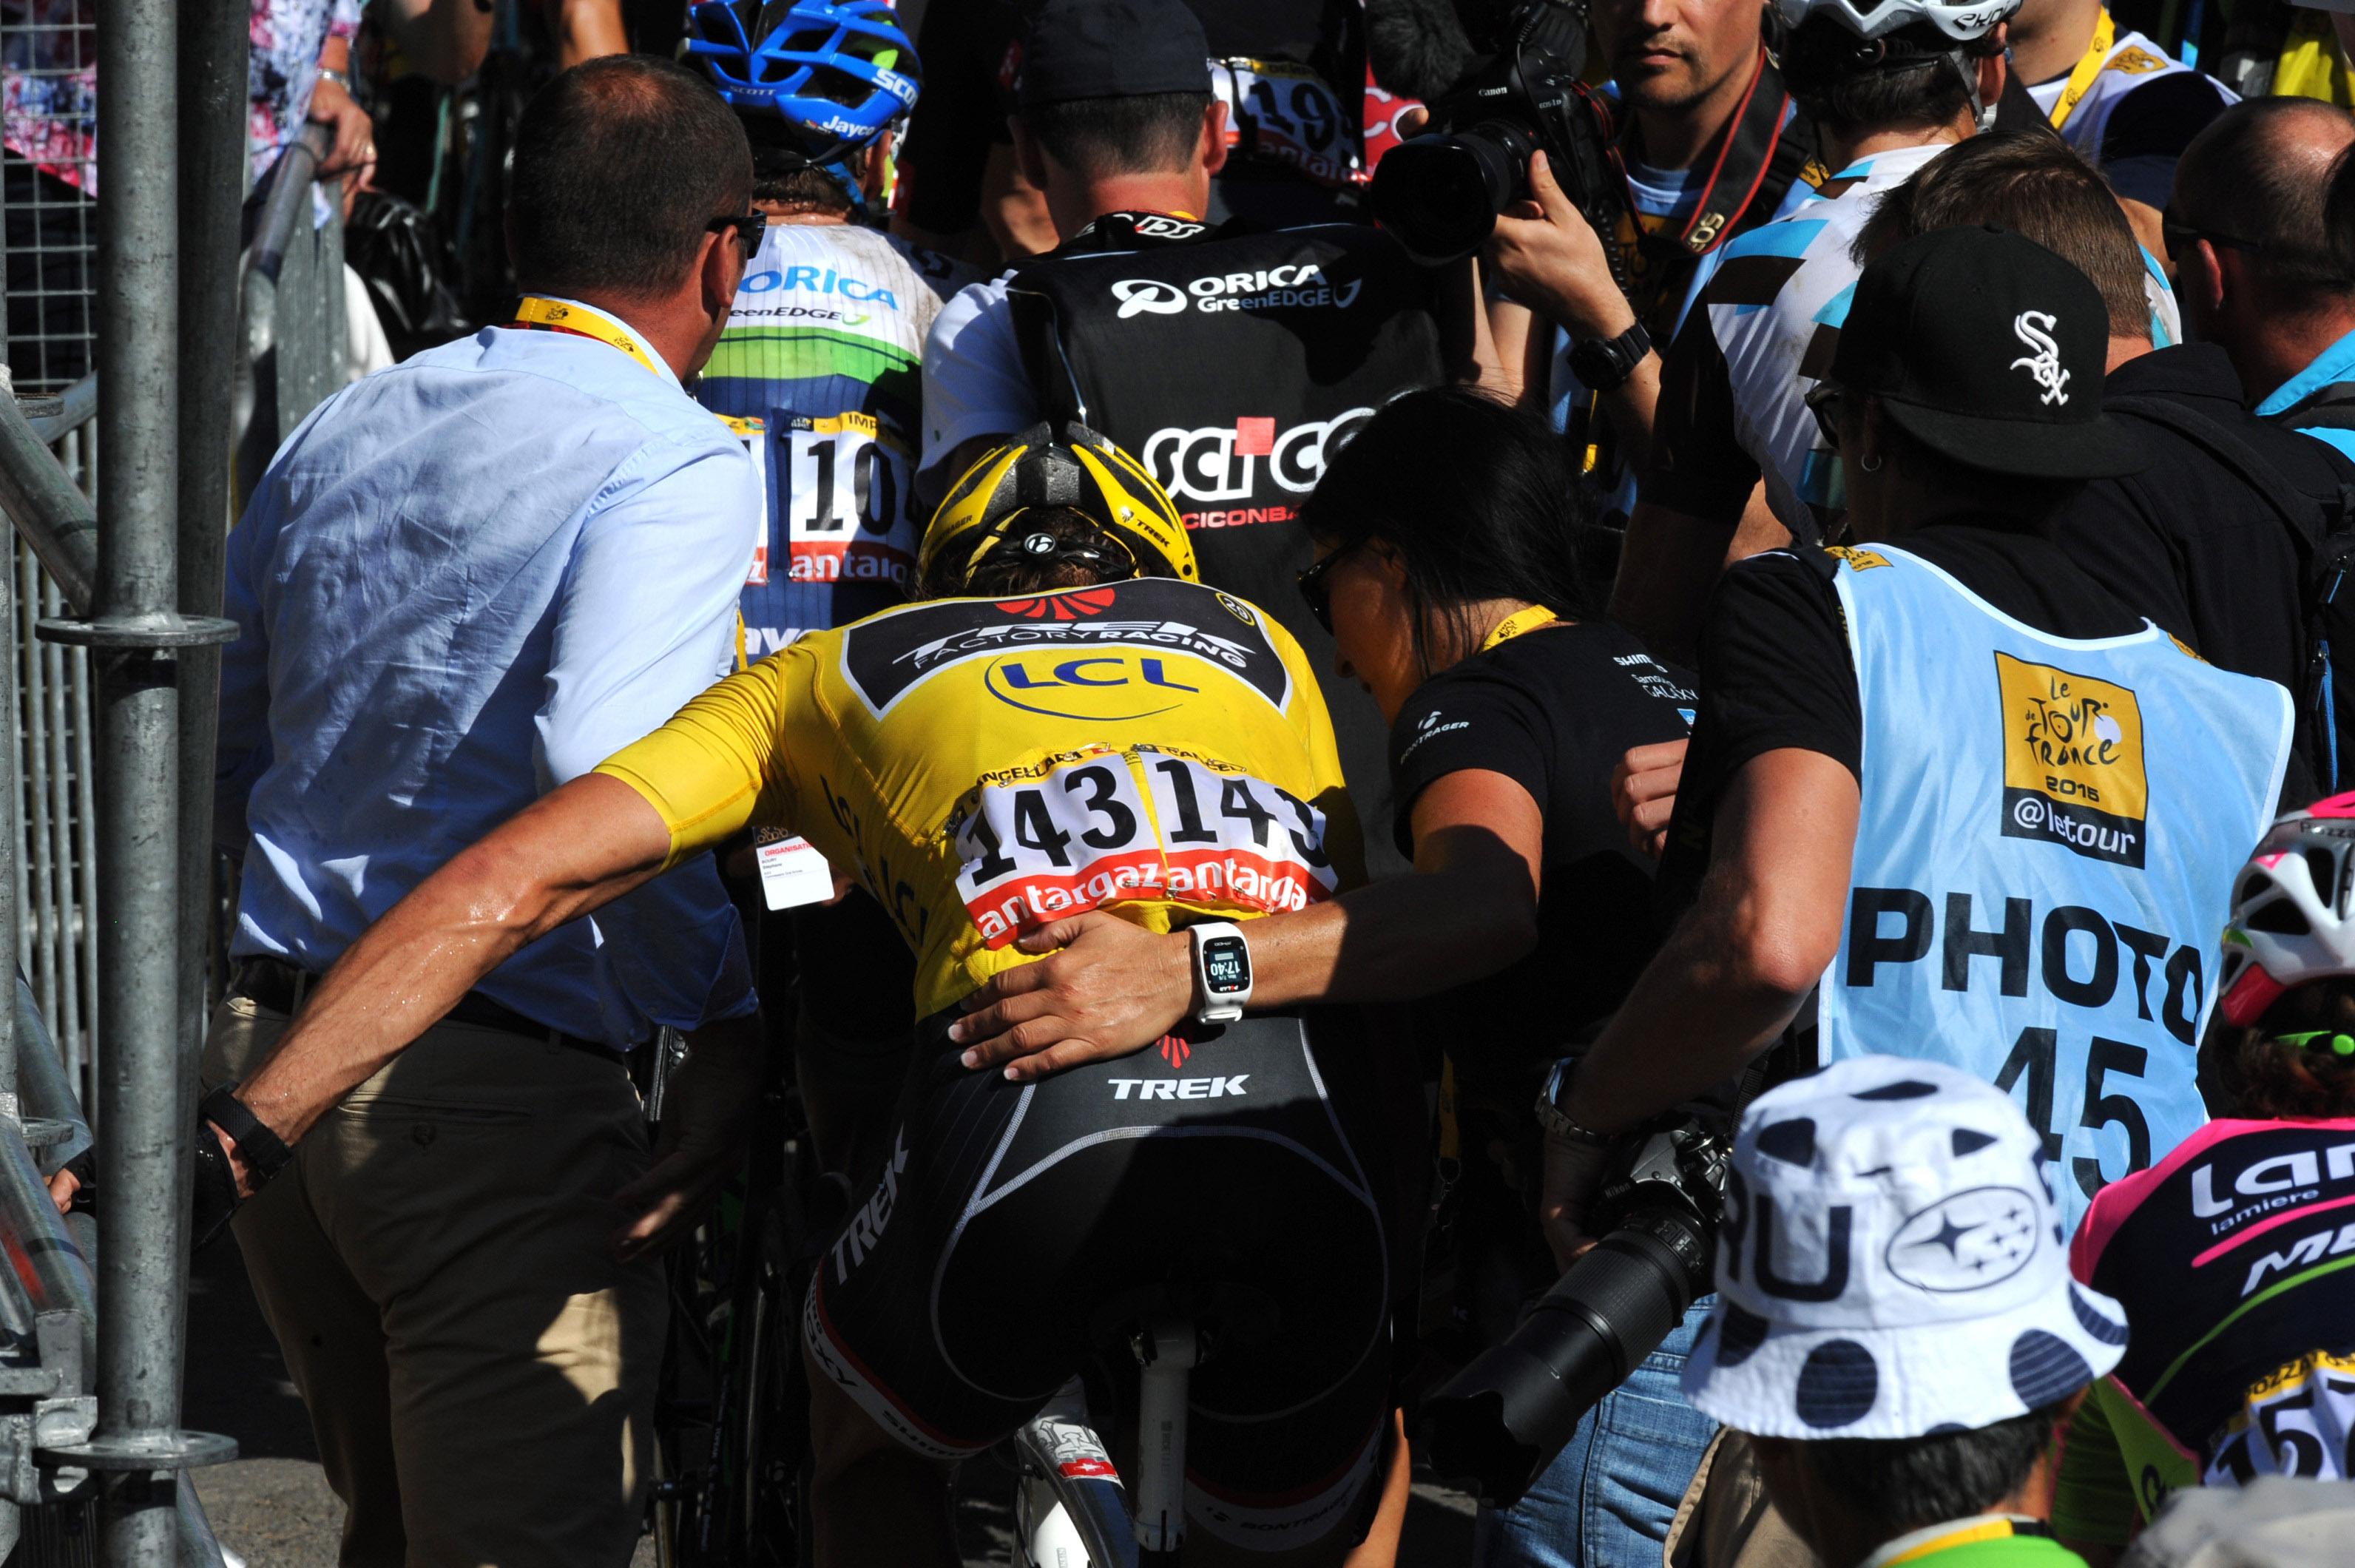 Fabian Cancellara - Tour de France 2015. (pic: Sirotti)